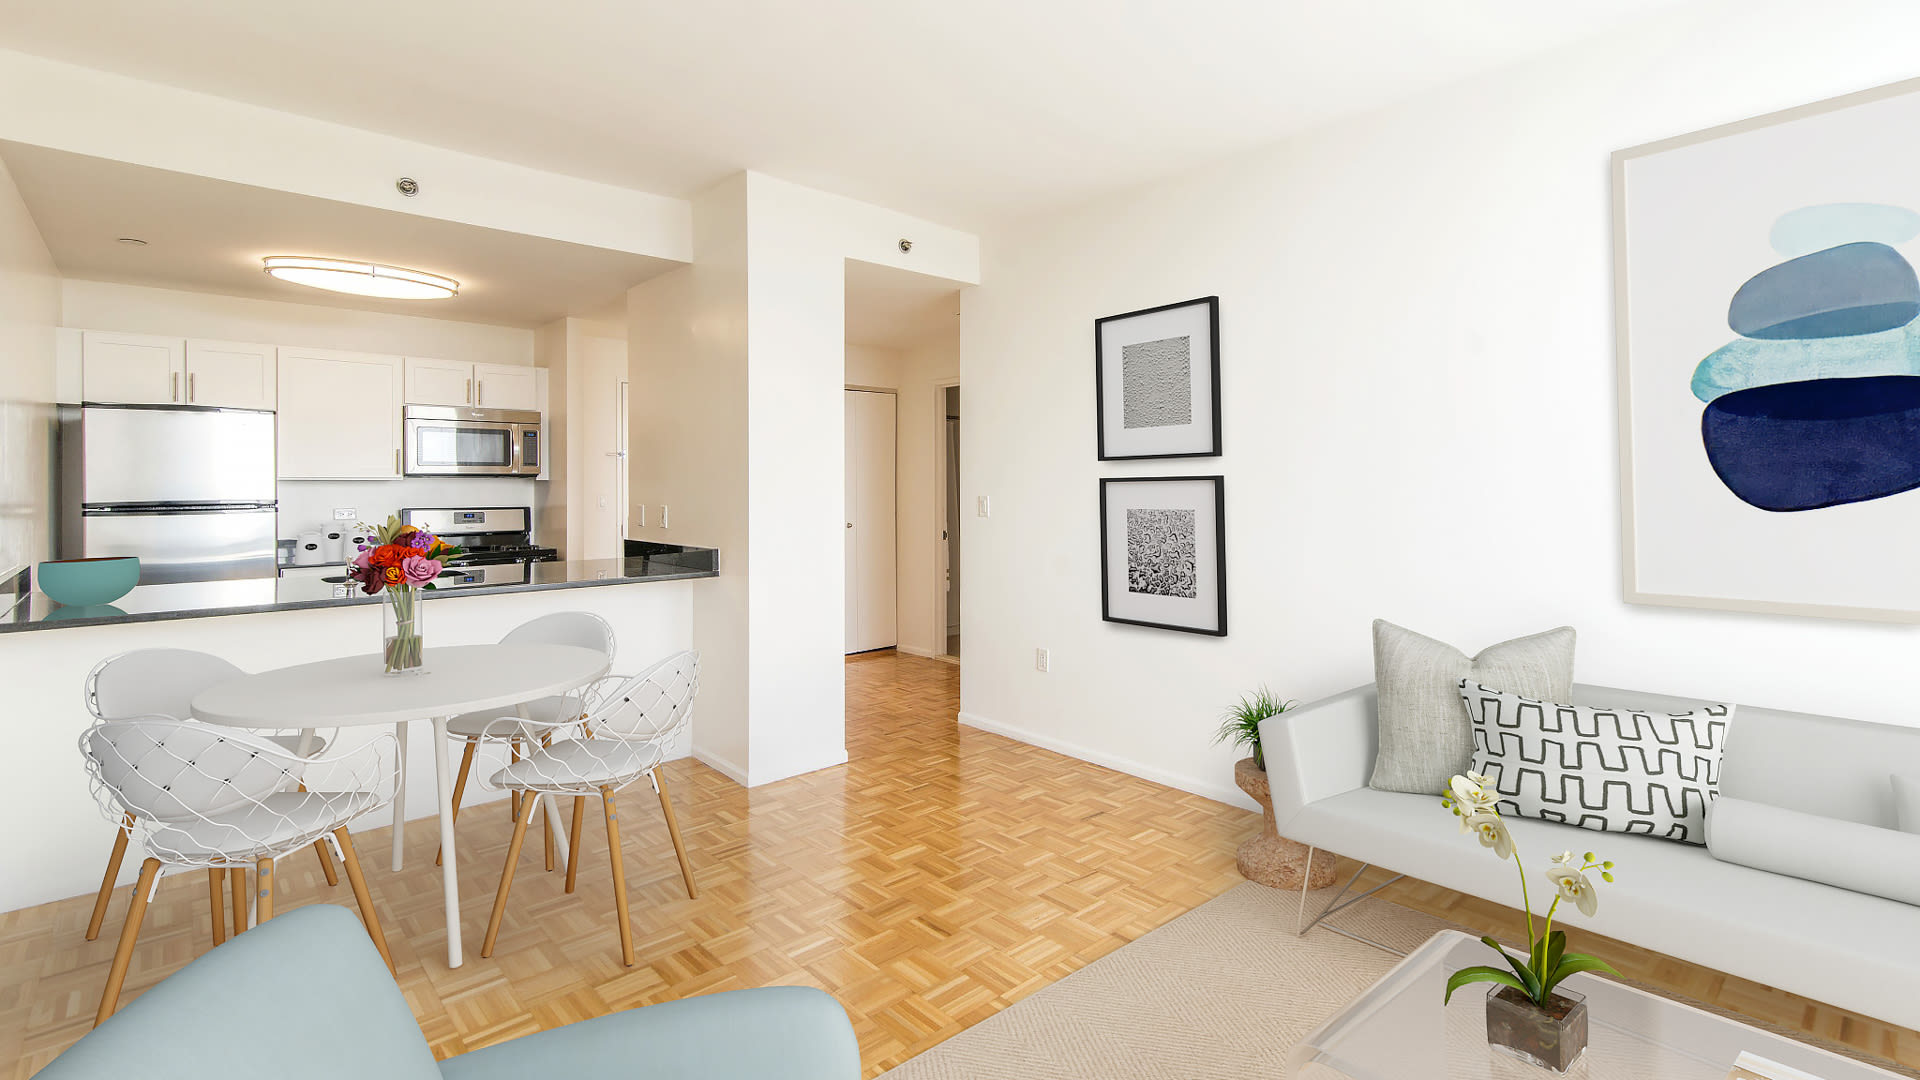 180 Montague Apartments - Open Floorplan with Wood Parquet Floor